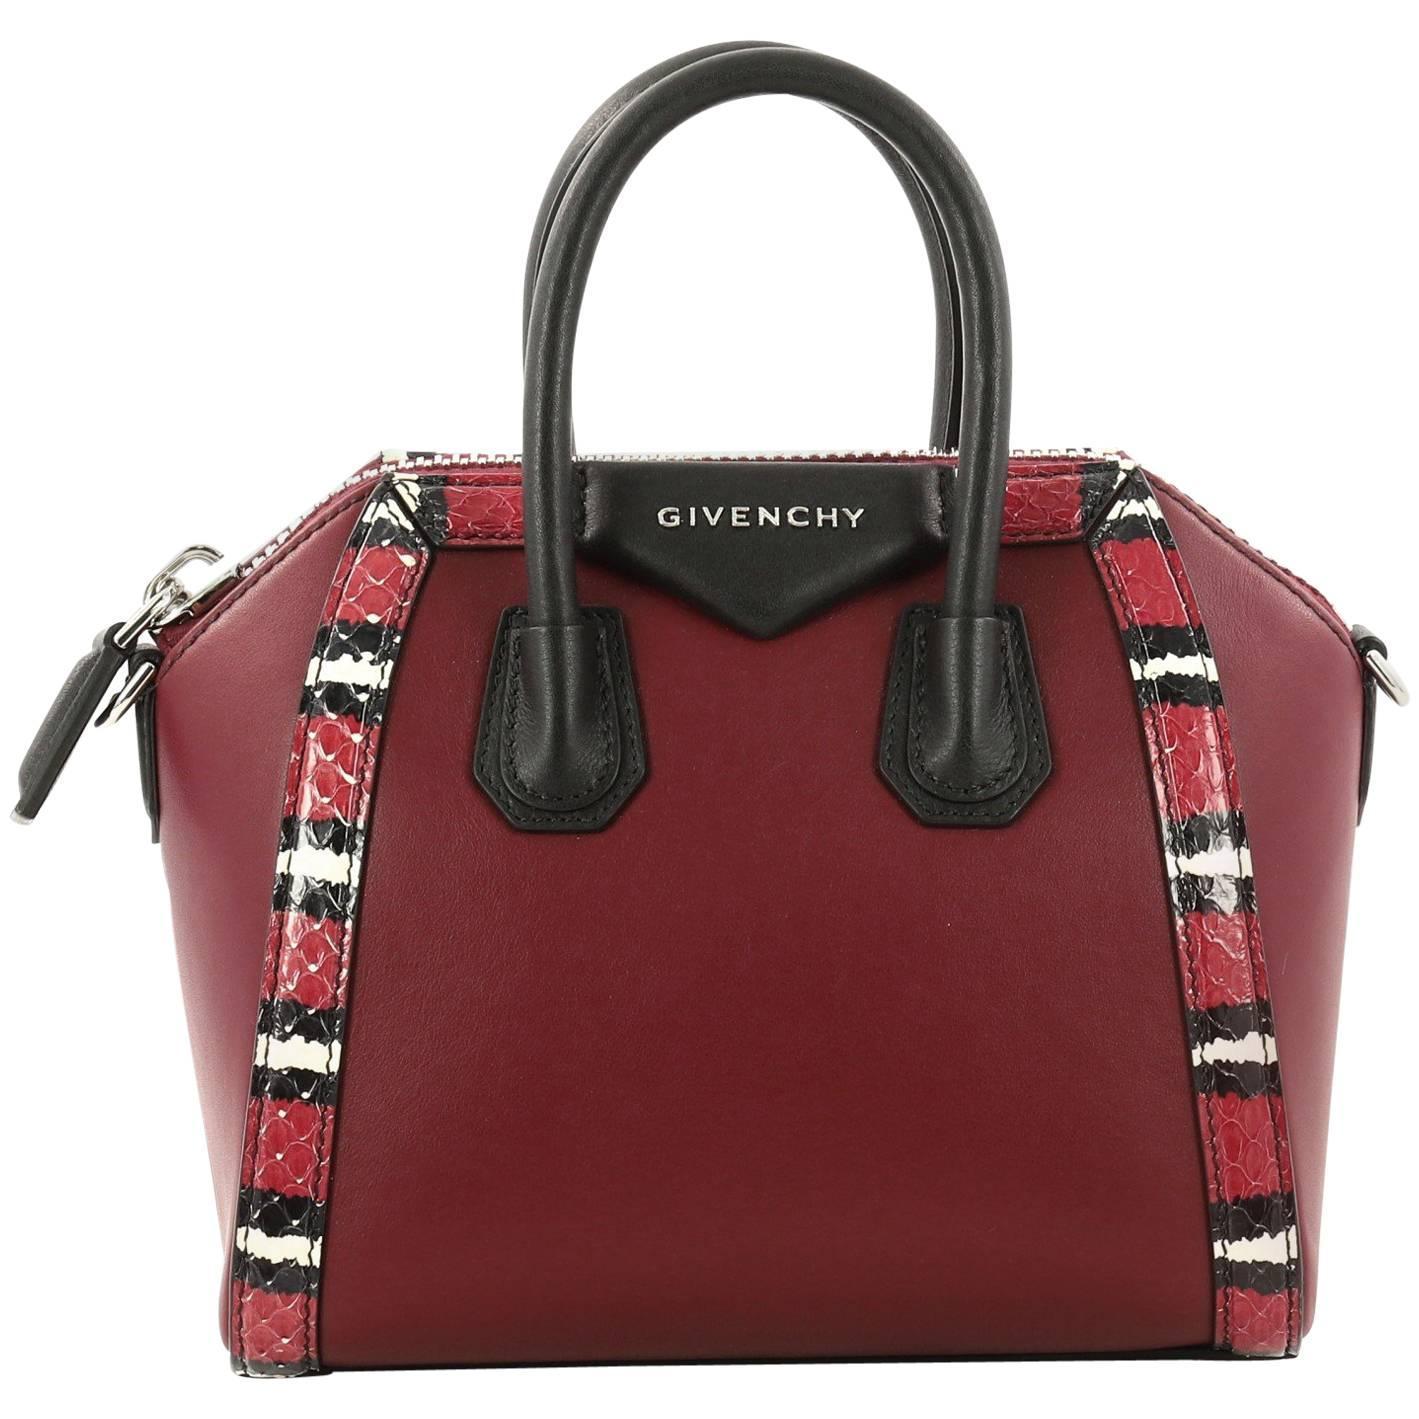 Givenchy Antigona Bag Leather With Snakeskin Mini From 2017 1t6Ylb